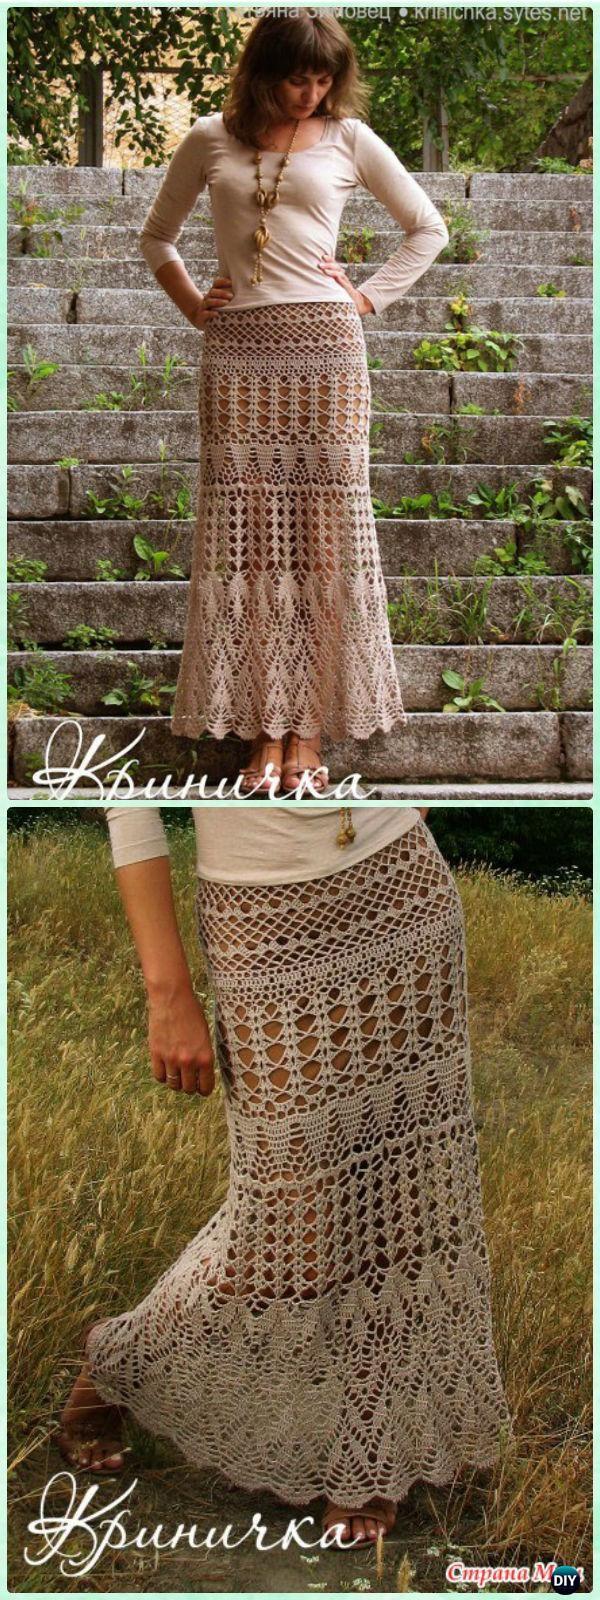 Crochet Evening Lace Maxi Skirt Free Diagram - Crochet Women Skirt Free Pattern